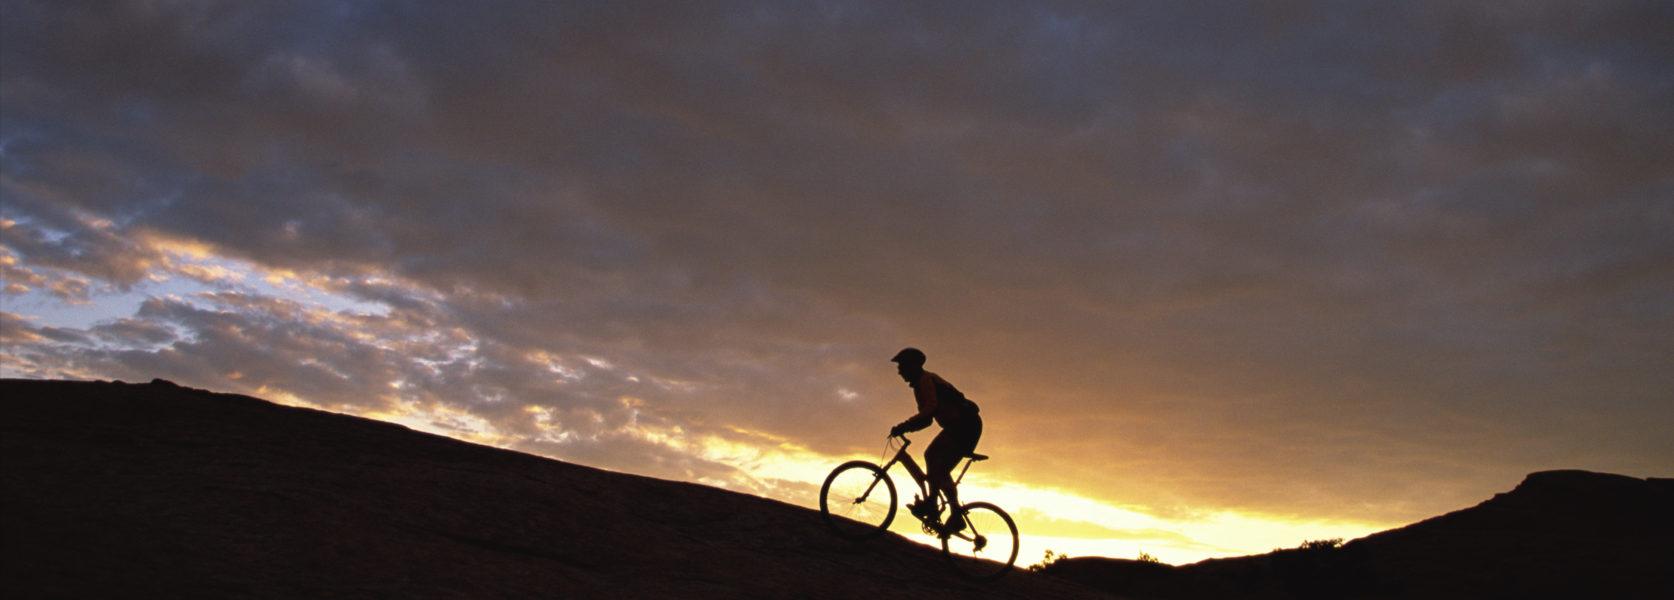 Return of BC Bike Race to the Cowichan Region in 2019